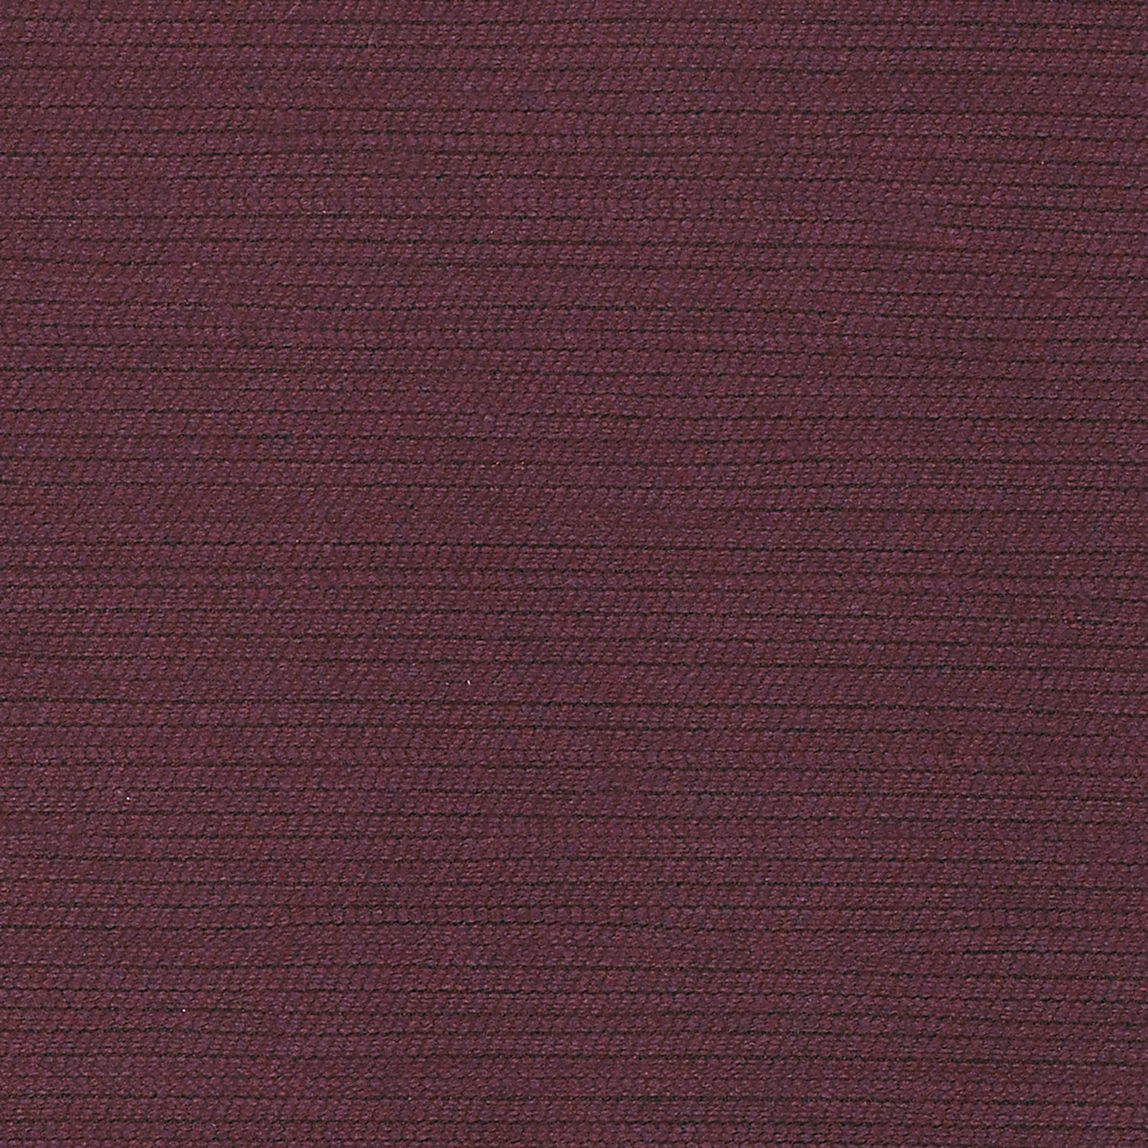 Weaving Palettes Aubergine Swatch